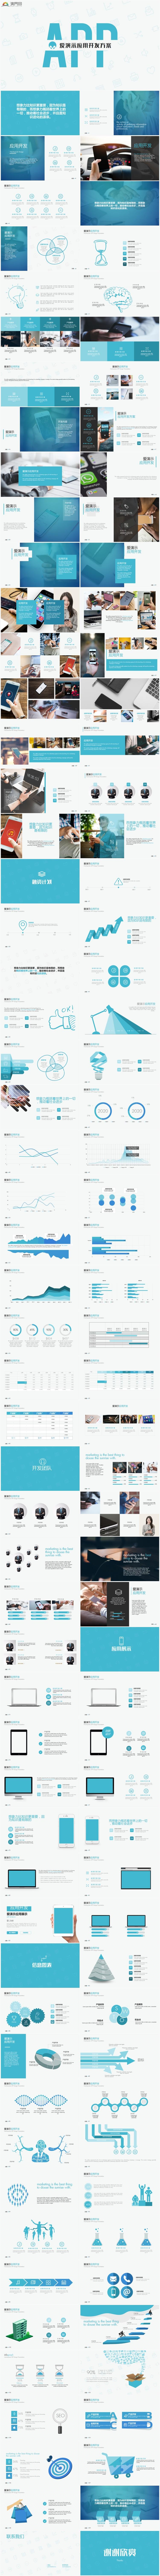 app应用软件互联网科技产品案例介绍ppt模板